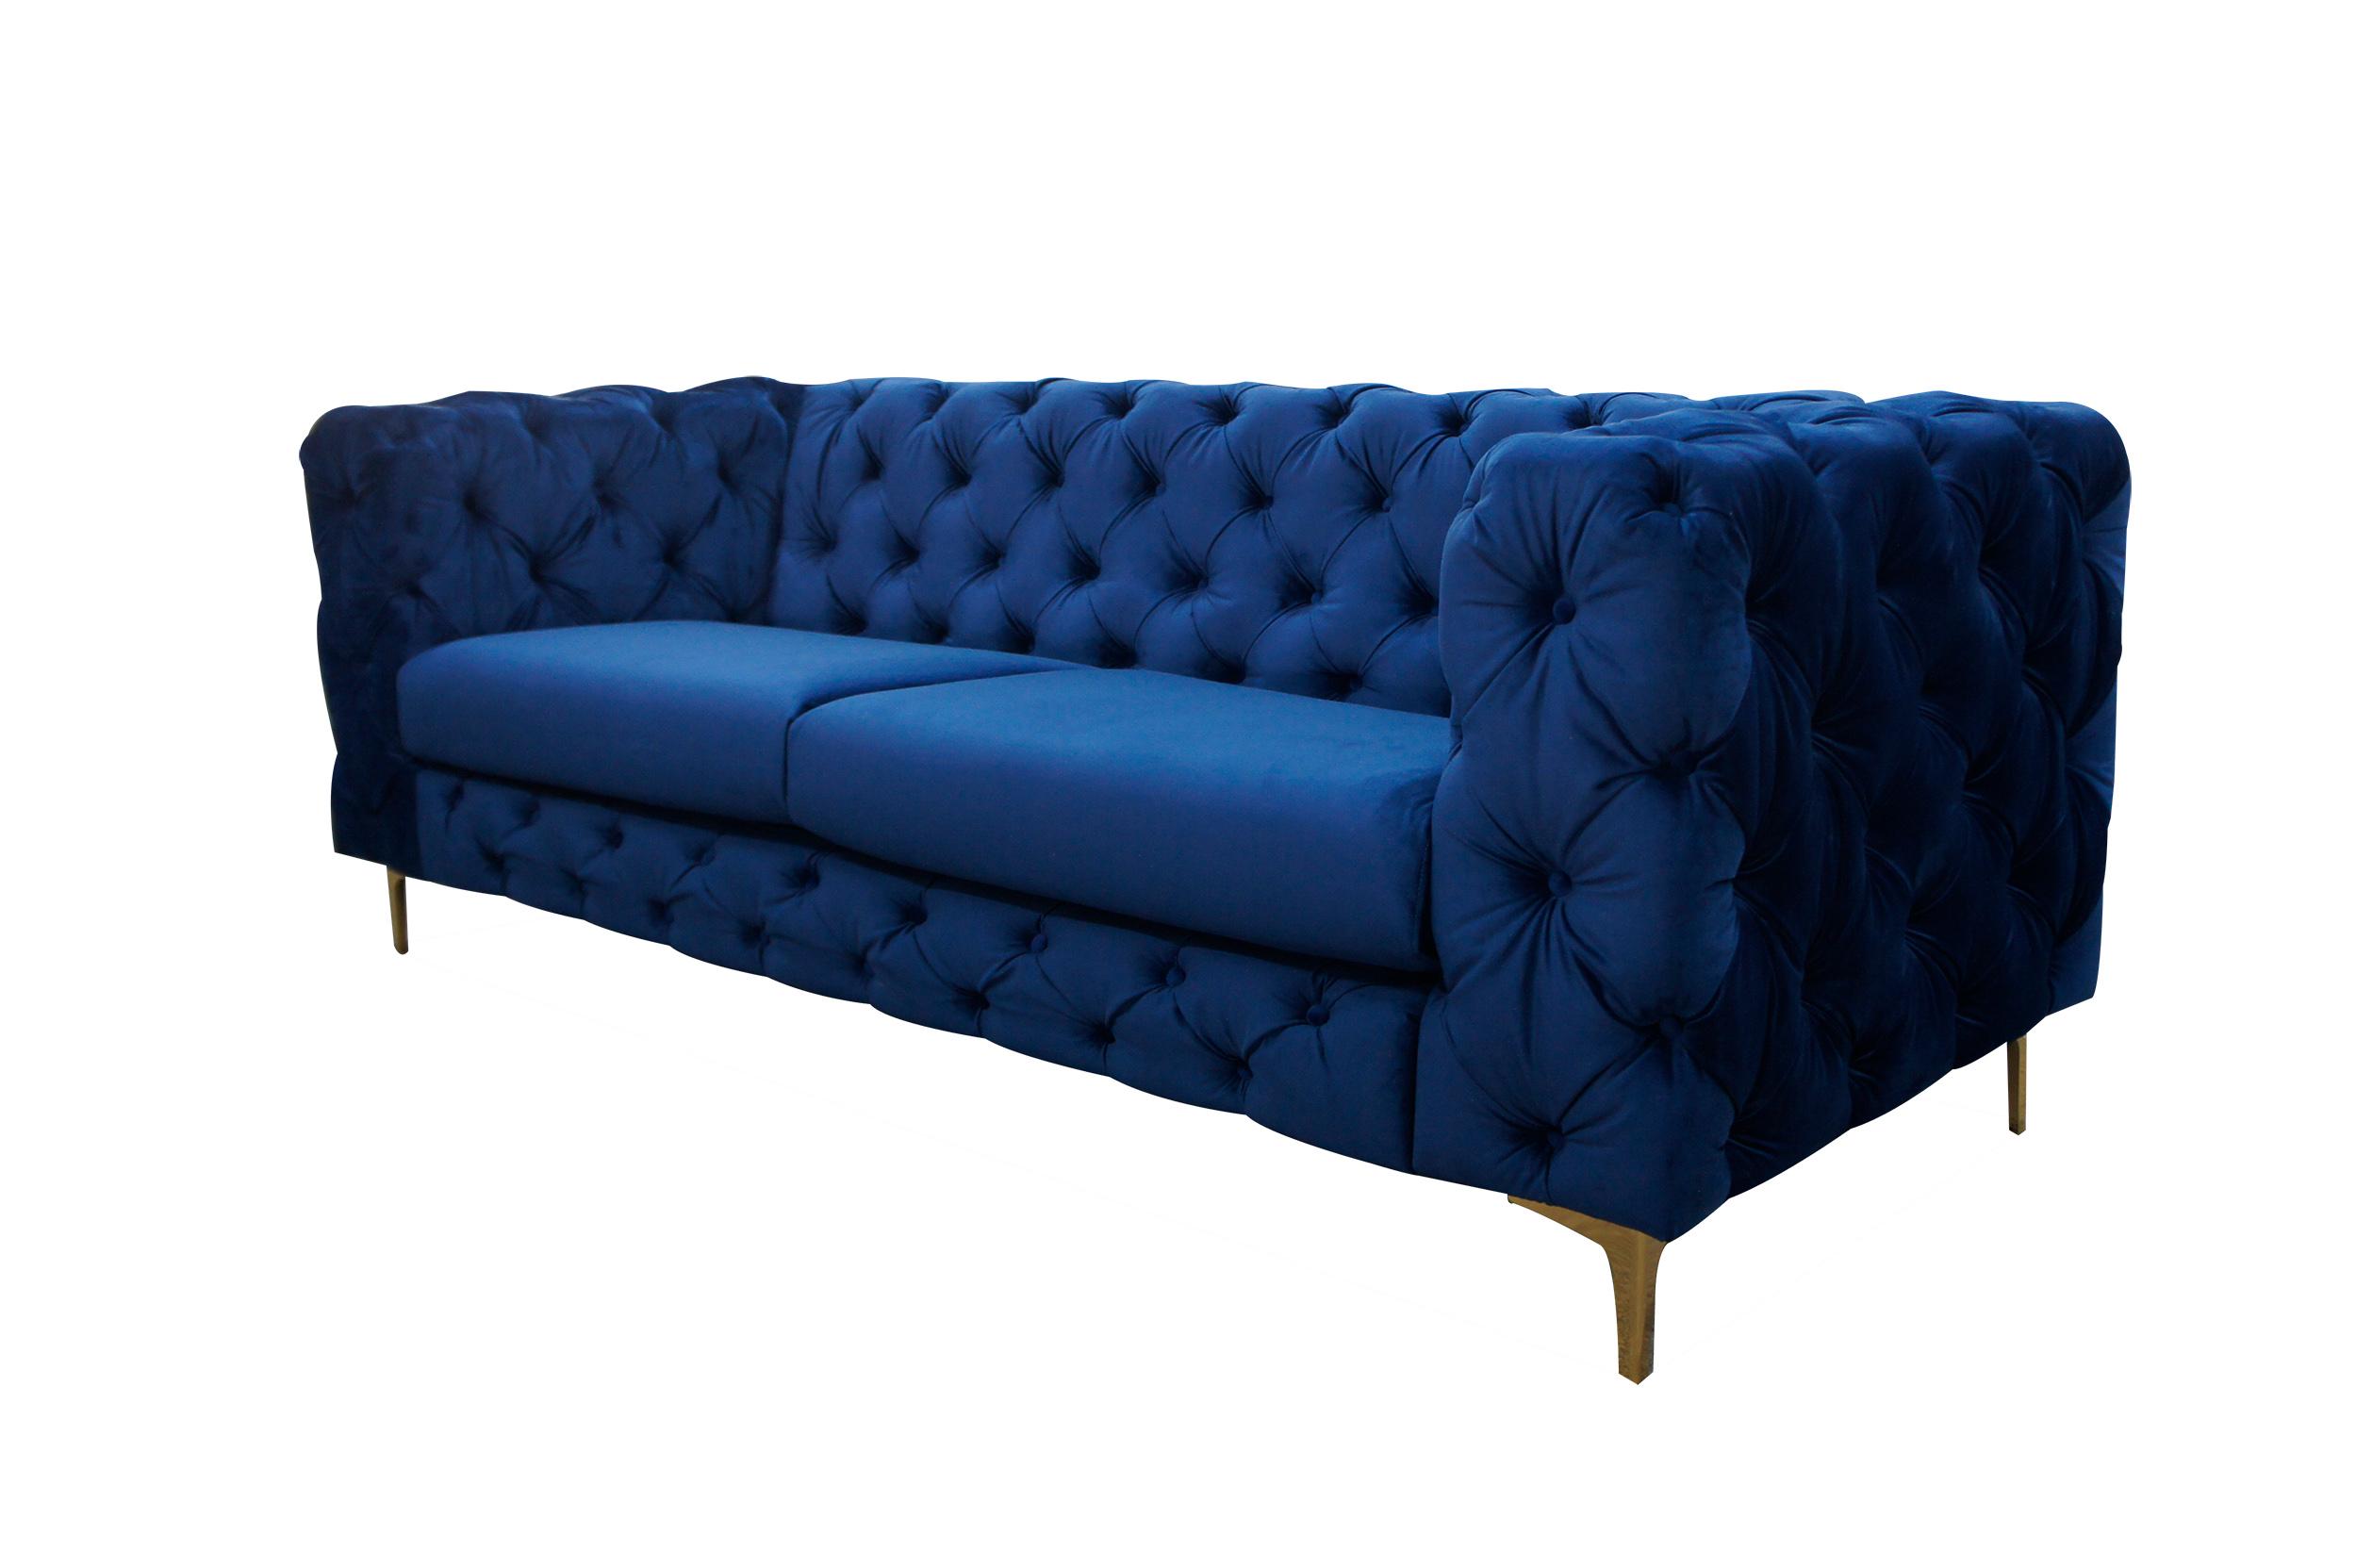 Full Size of Sofa Barock Gebraucht Schwarz Gold Blau Barockstil Lc Home 3er Dreisitzer Couch Kingdom Chesterfield Samt Erpo Abnehmbarer Bezug Microfaser Polyrattan Rattan Sofa Sofa Barock